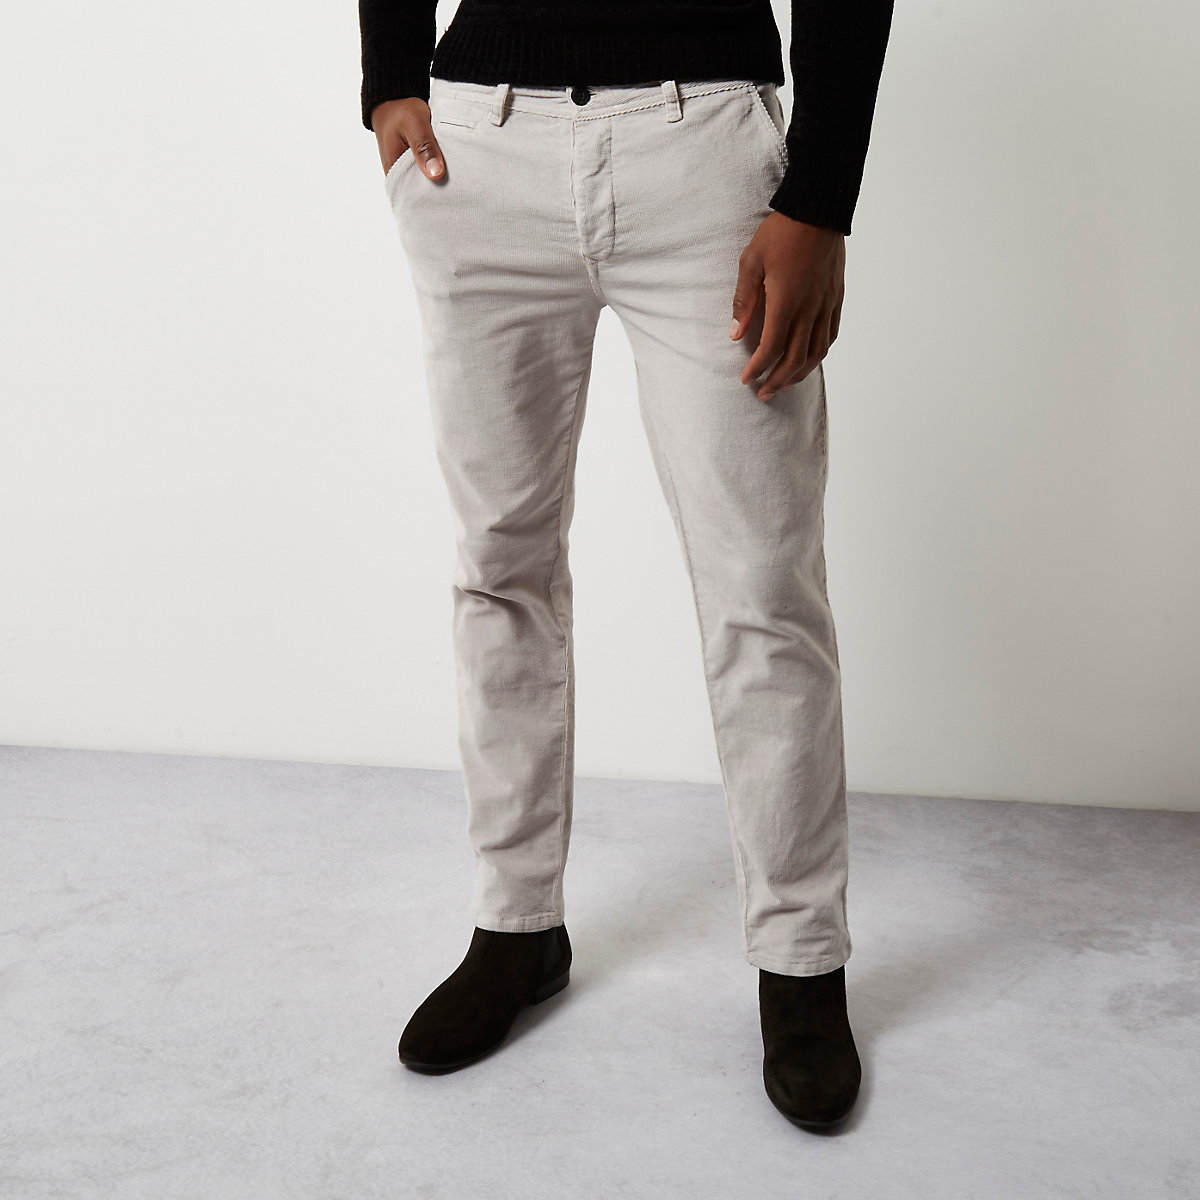 Stone slim fit corduroy chino pants